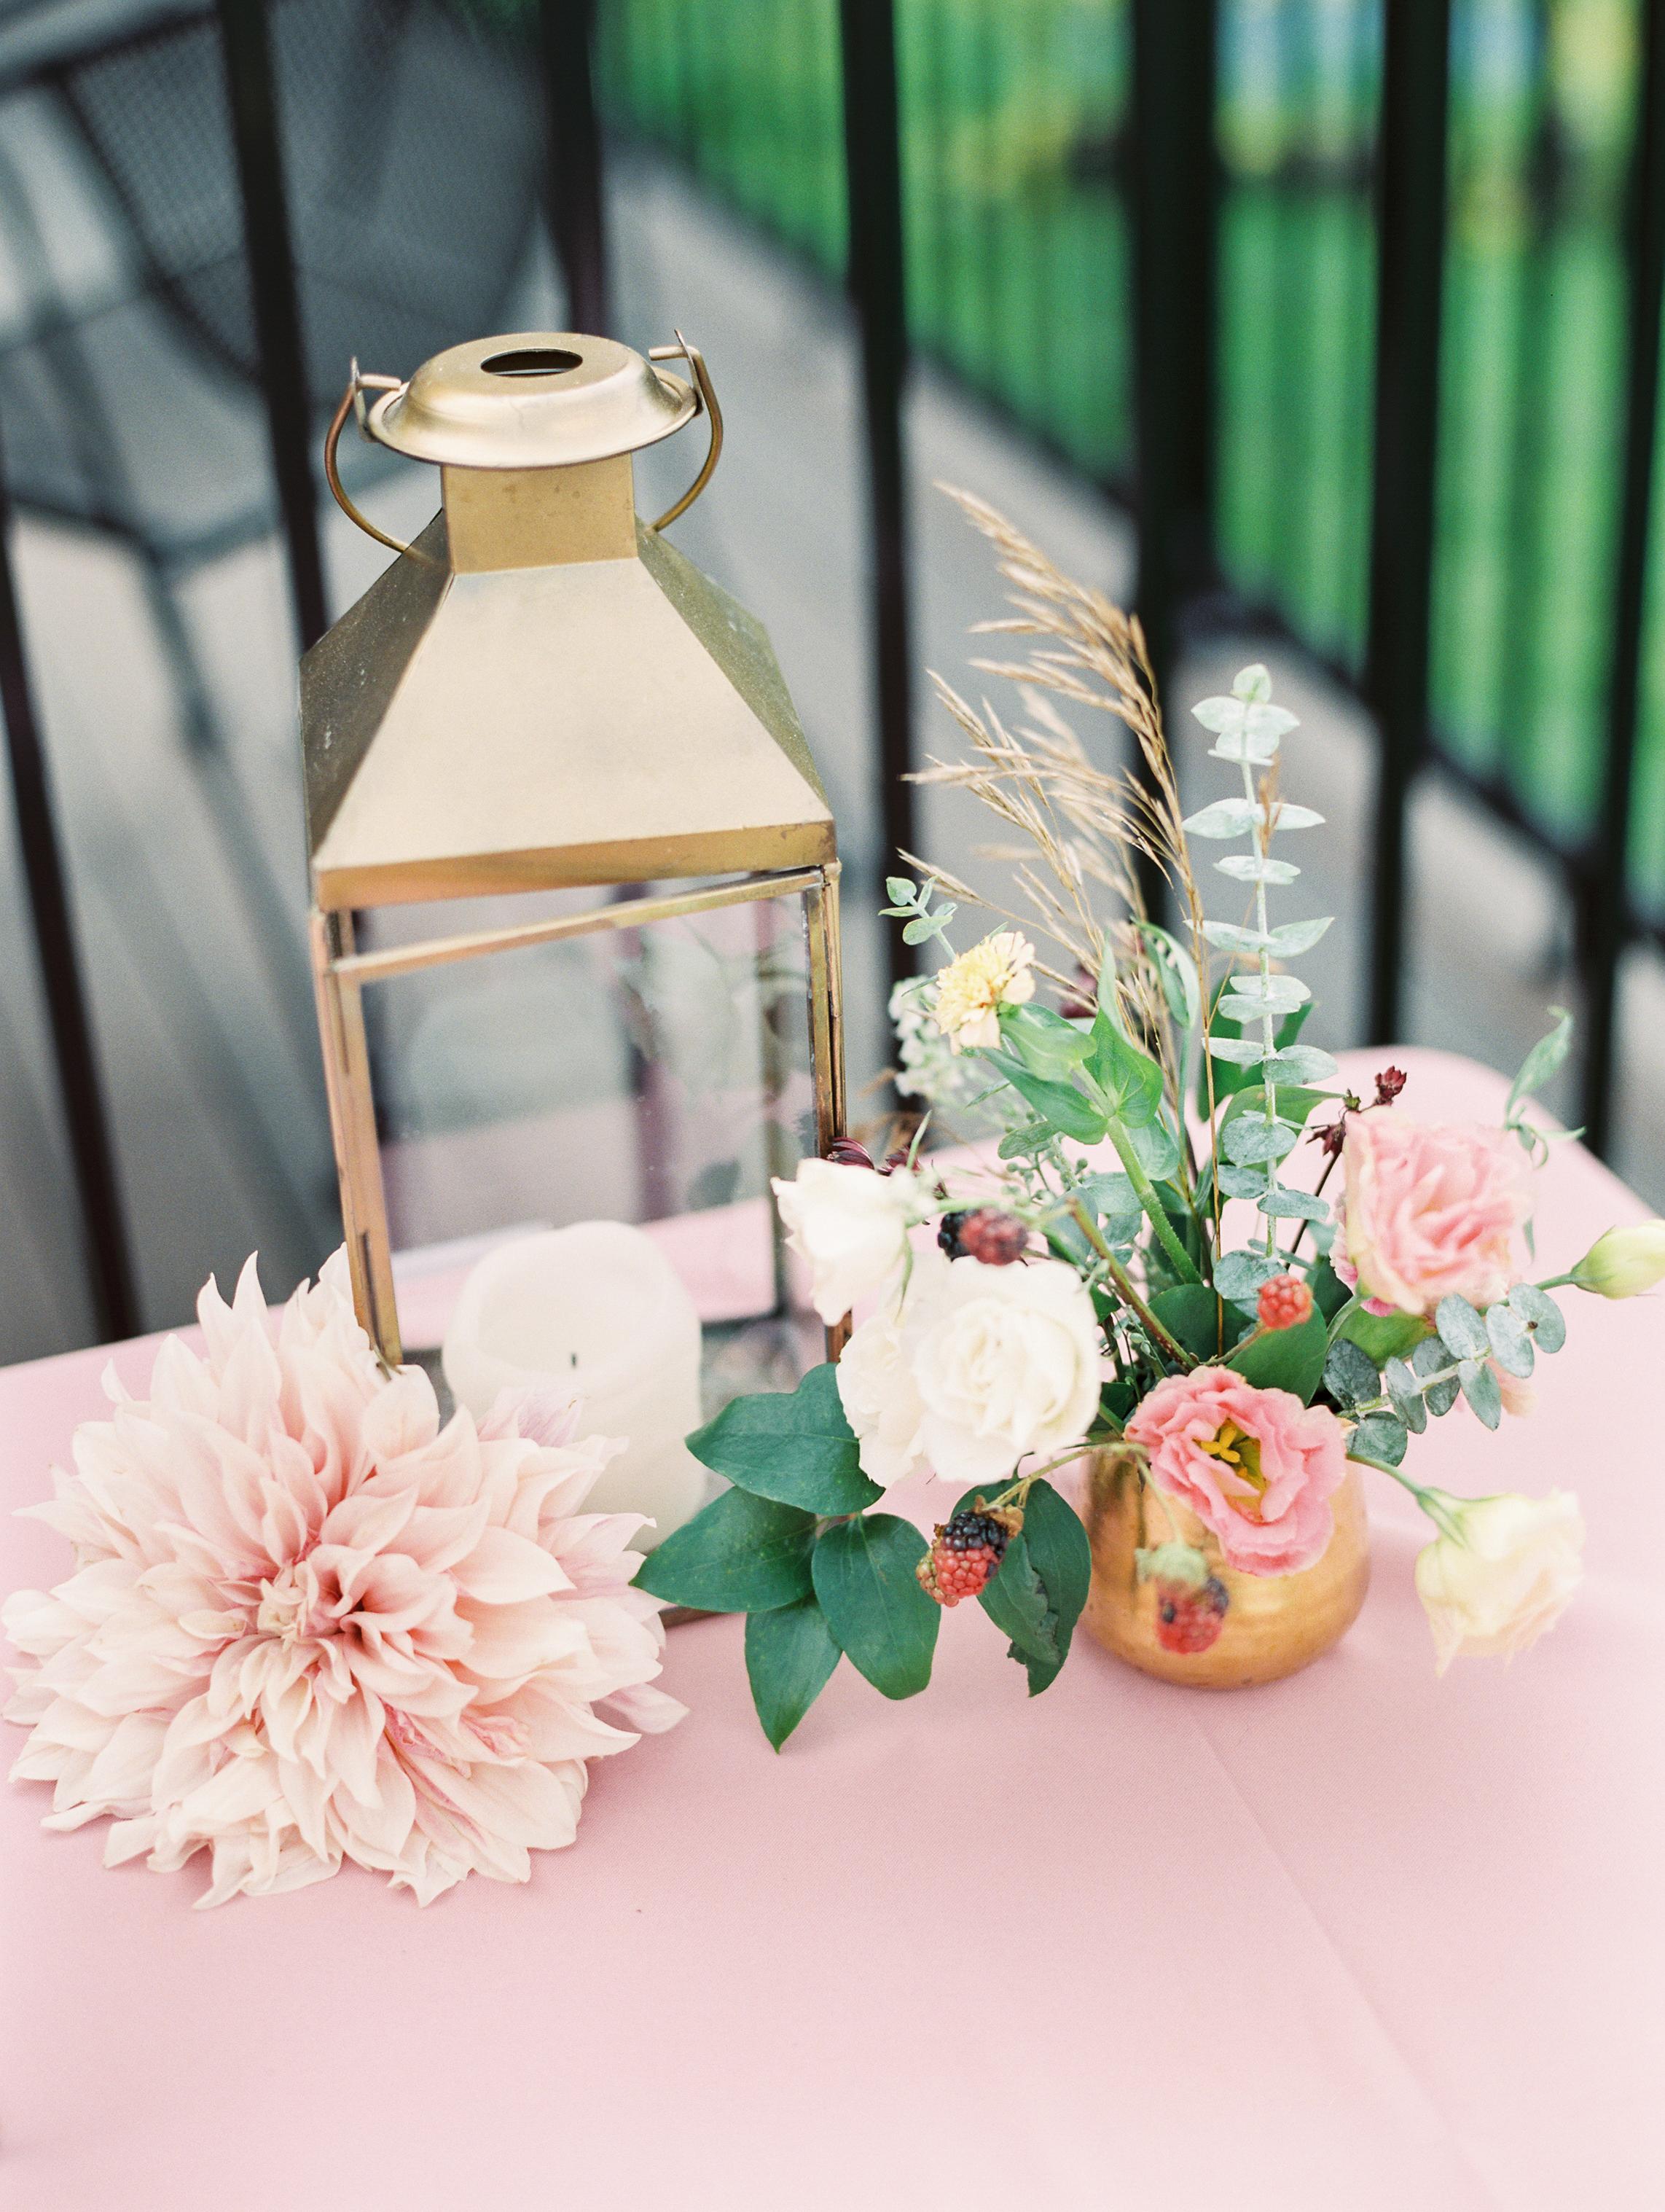 Zoller+Wedding+Reception+Detailsf-13.jpg